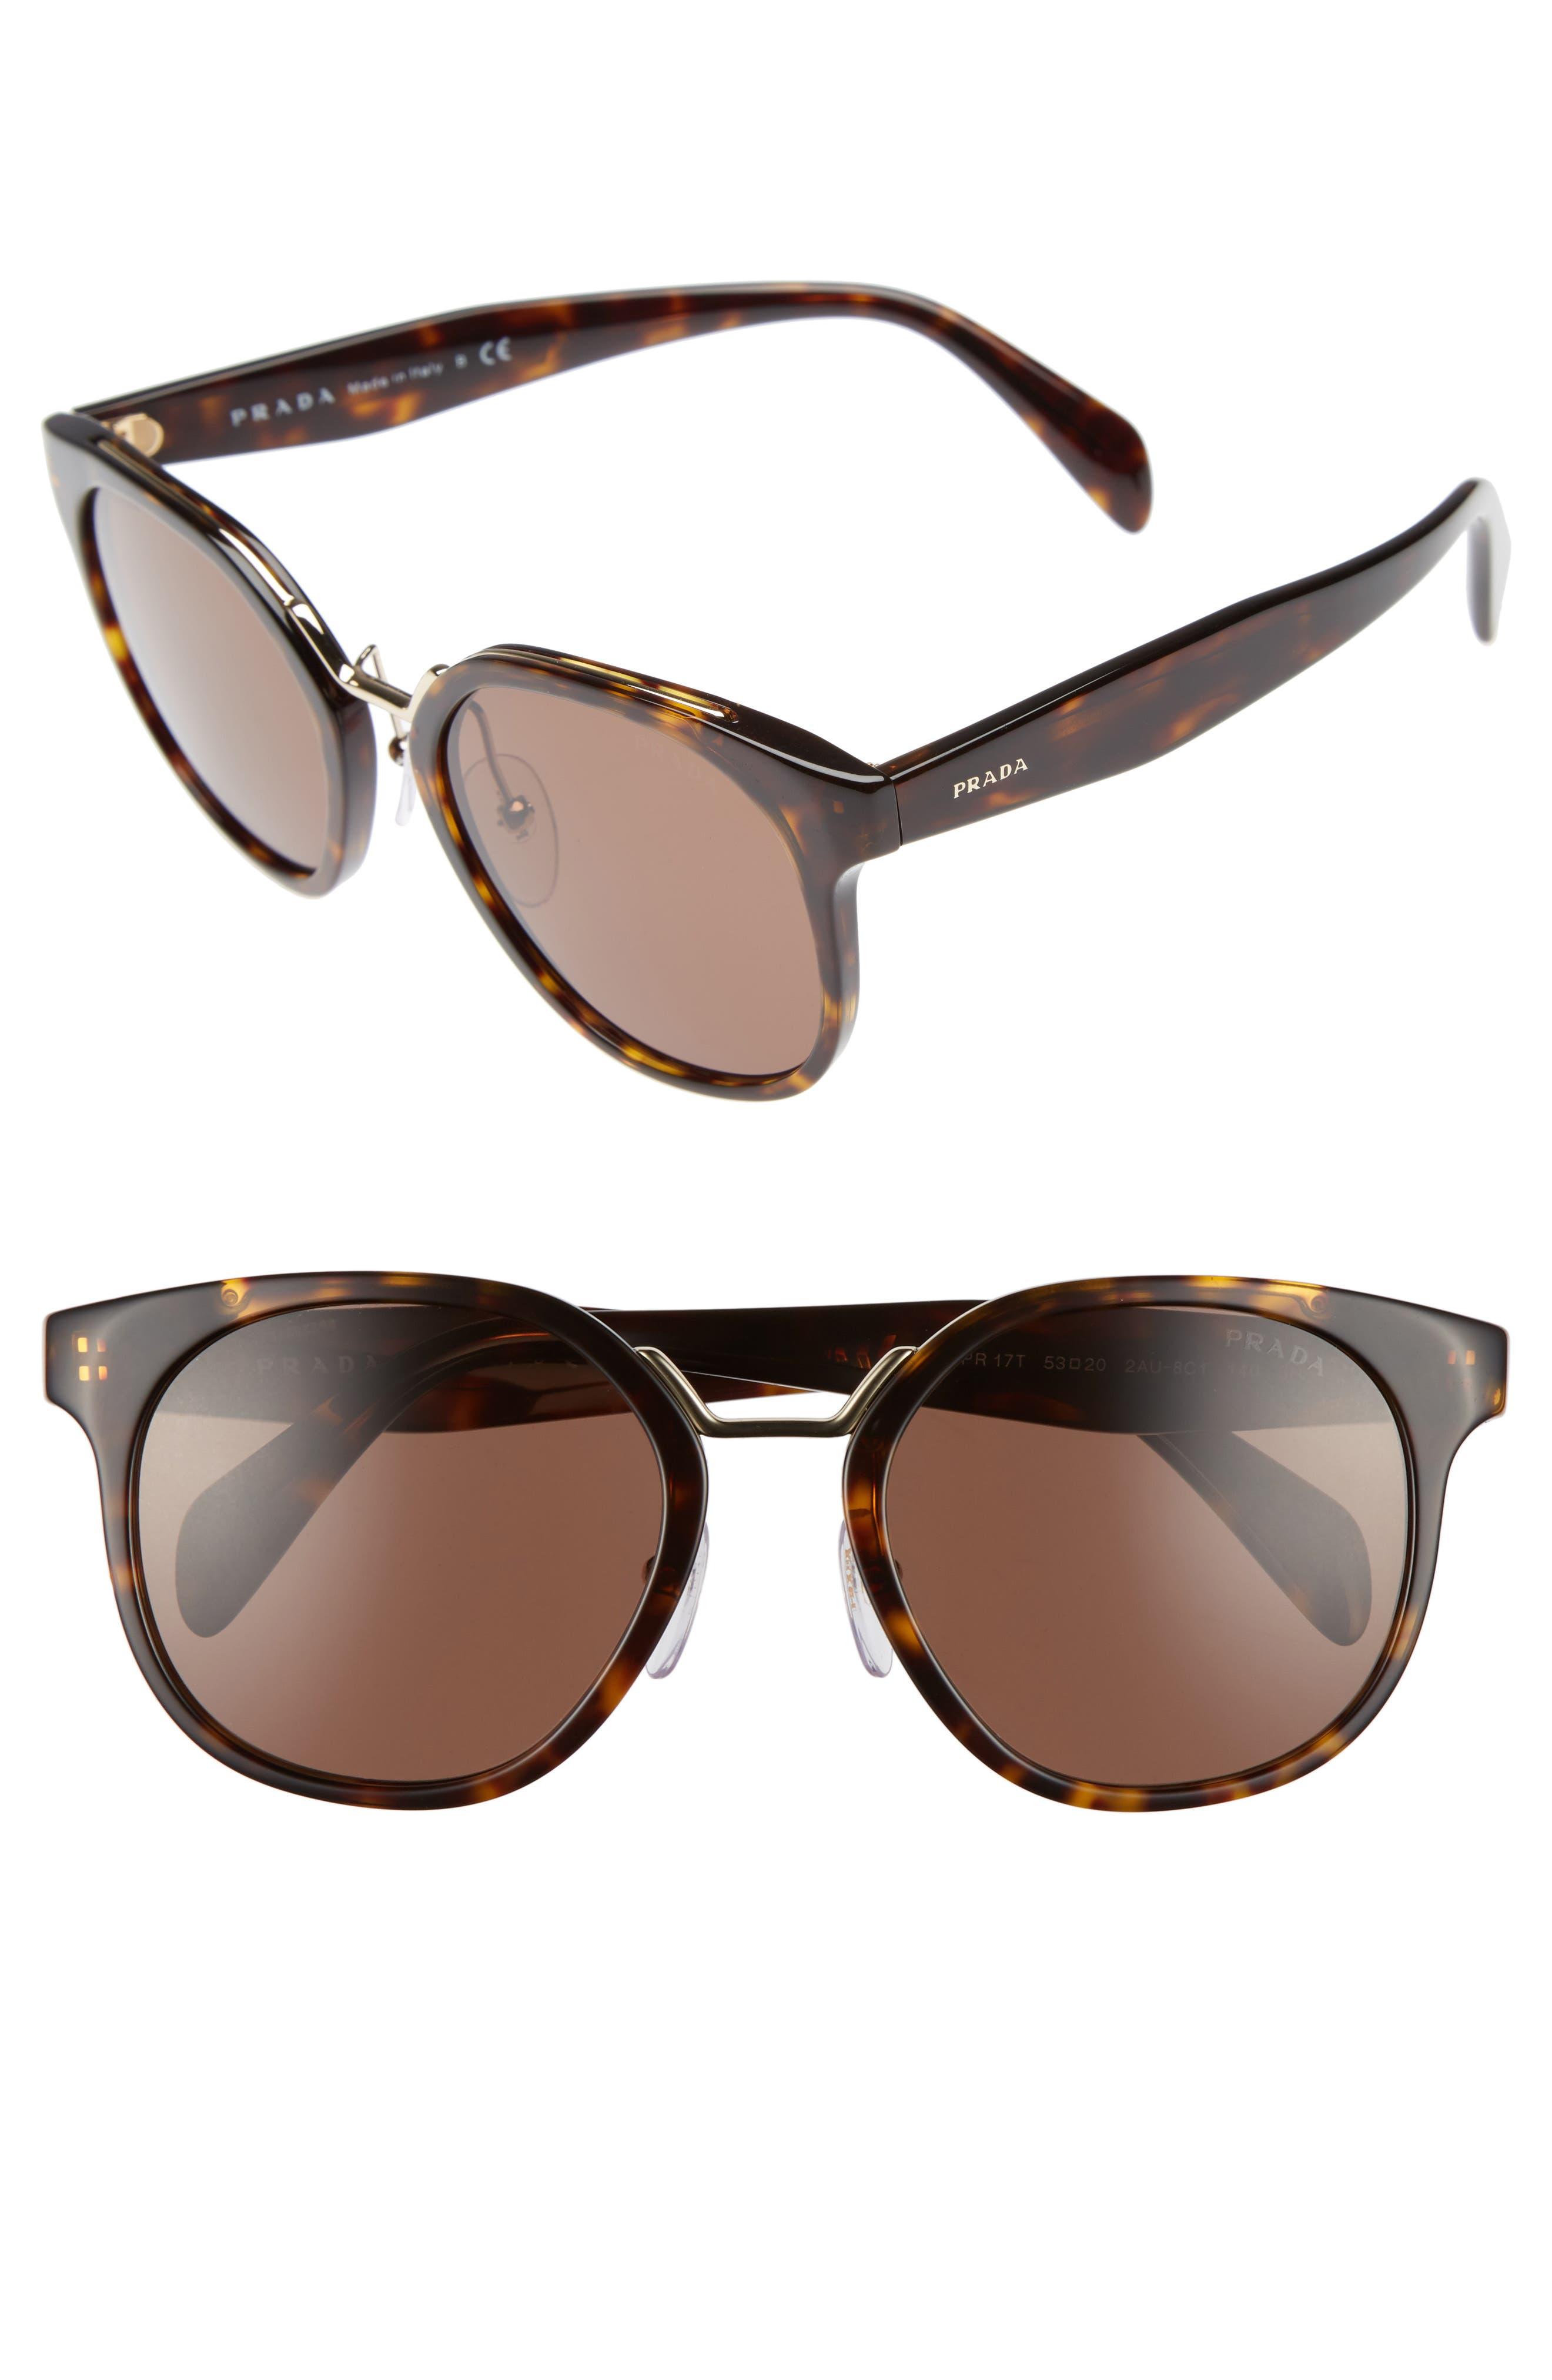 53mm Horn-Rimmed Sunglasses,                             Main thumbnail 1, color,                             Brown Havana